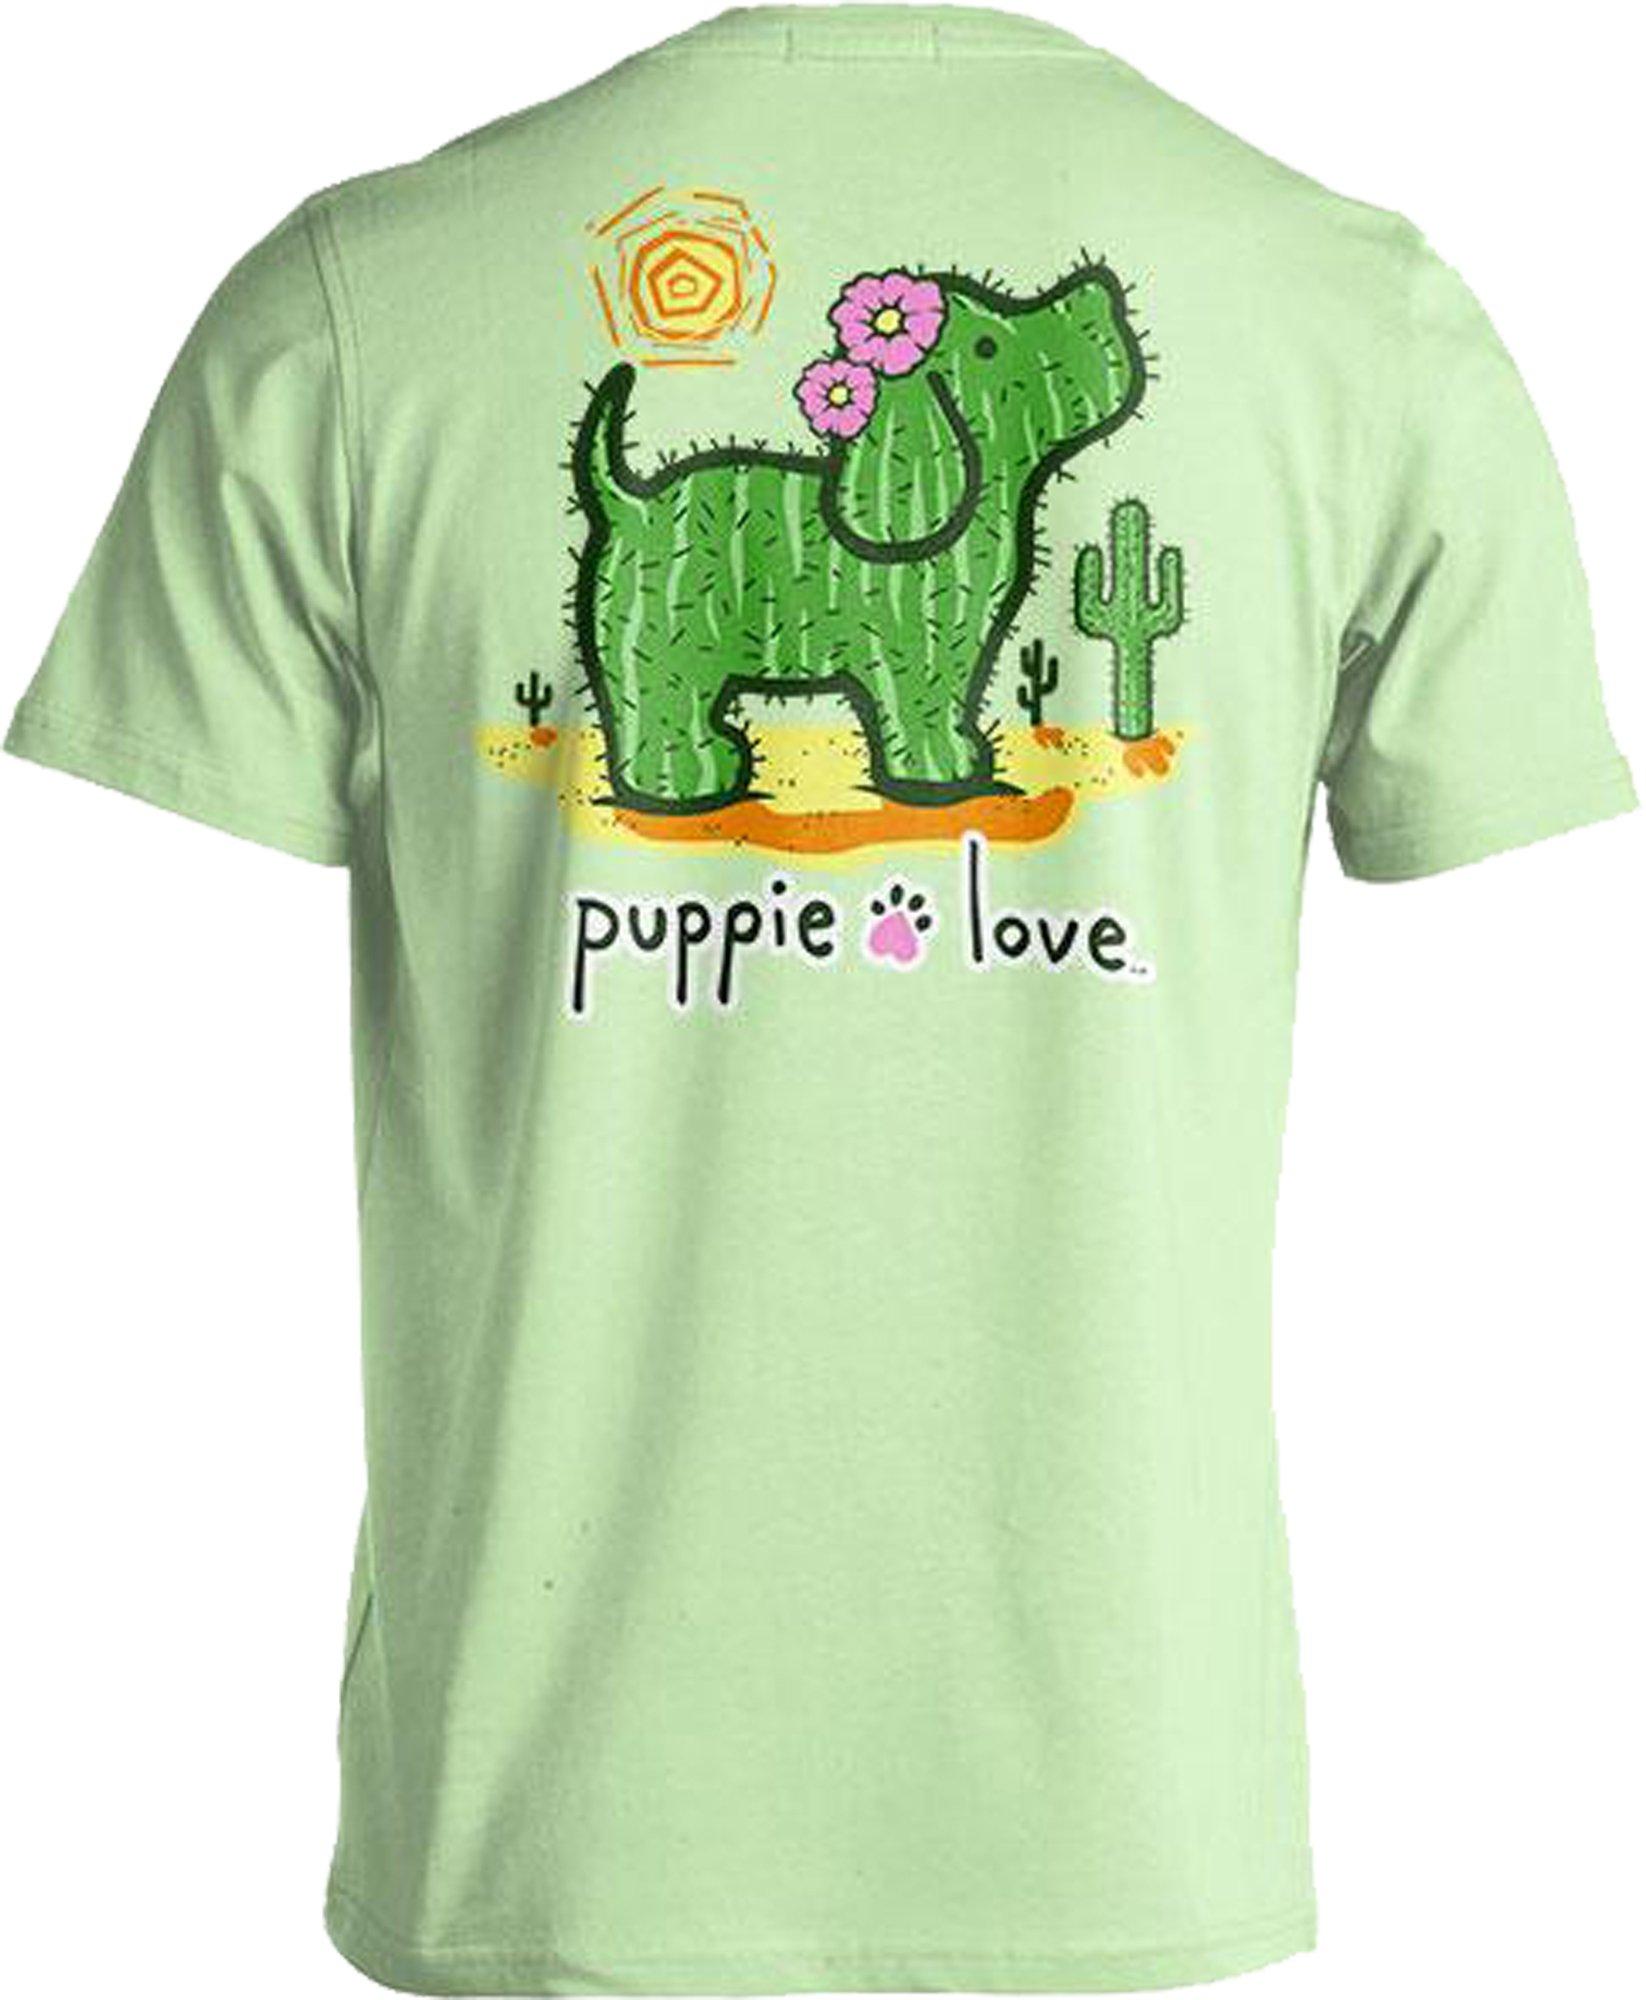 Rescue Dog Adult Unisex Short Sleeve Cotton T-Shirt, Cactus Pup (Small, Mint)